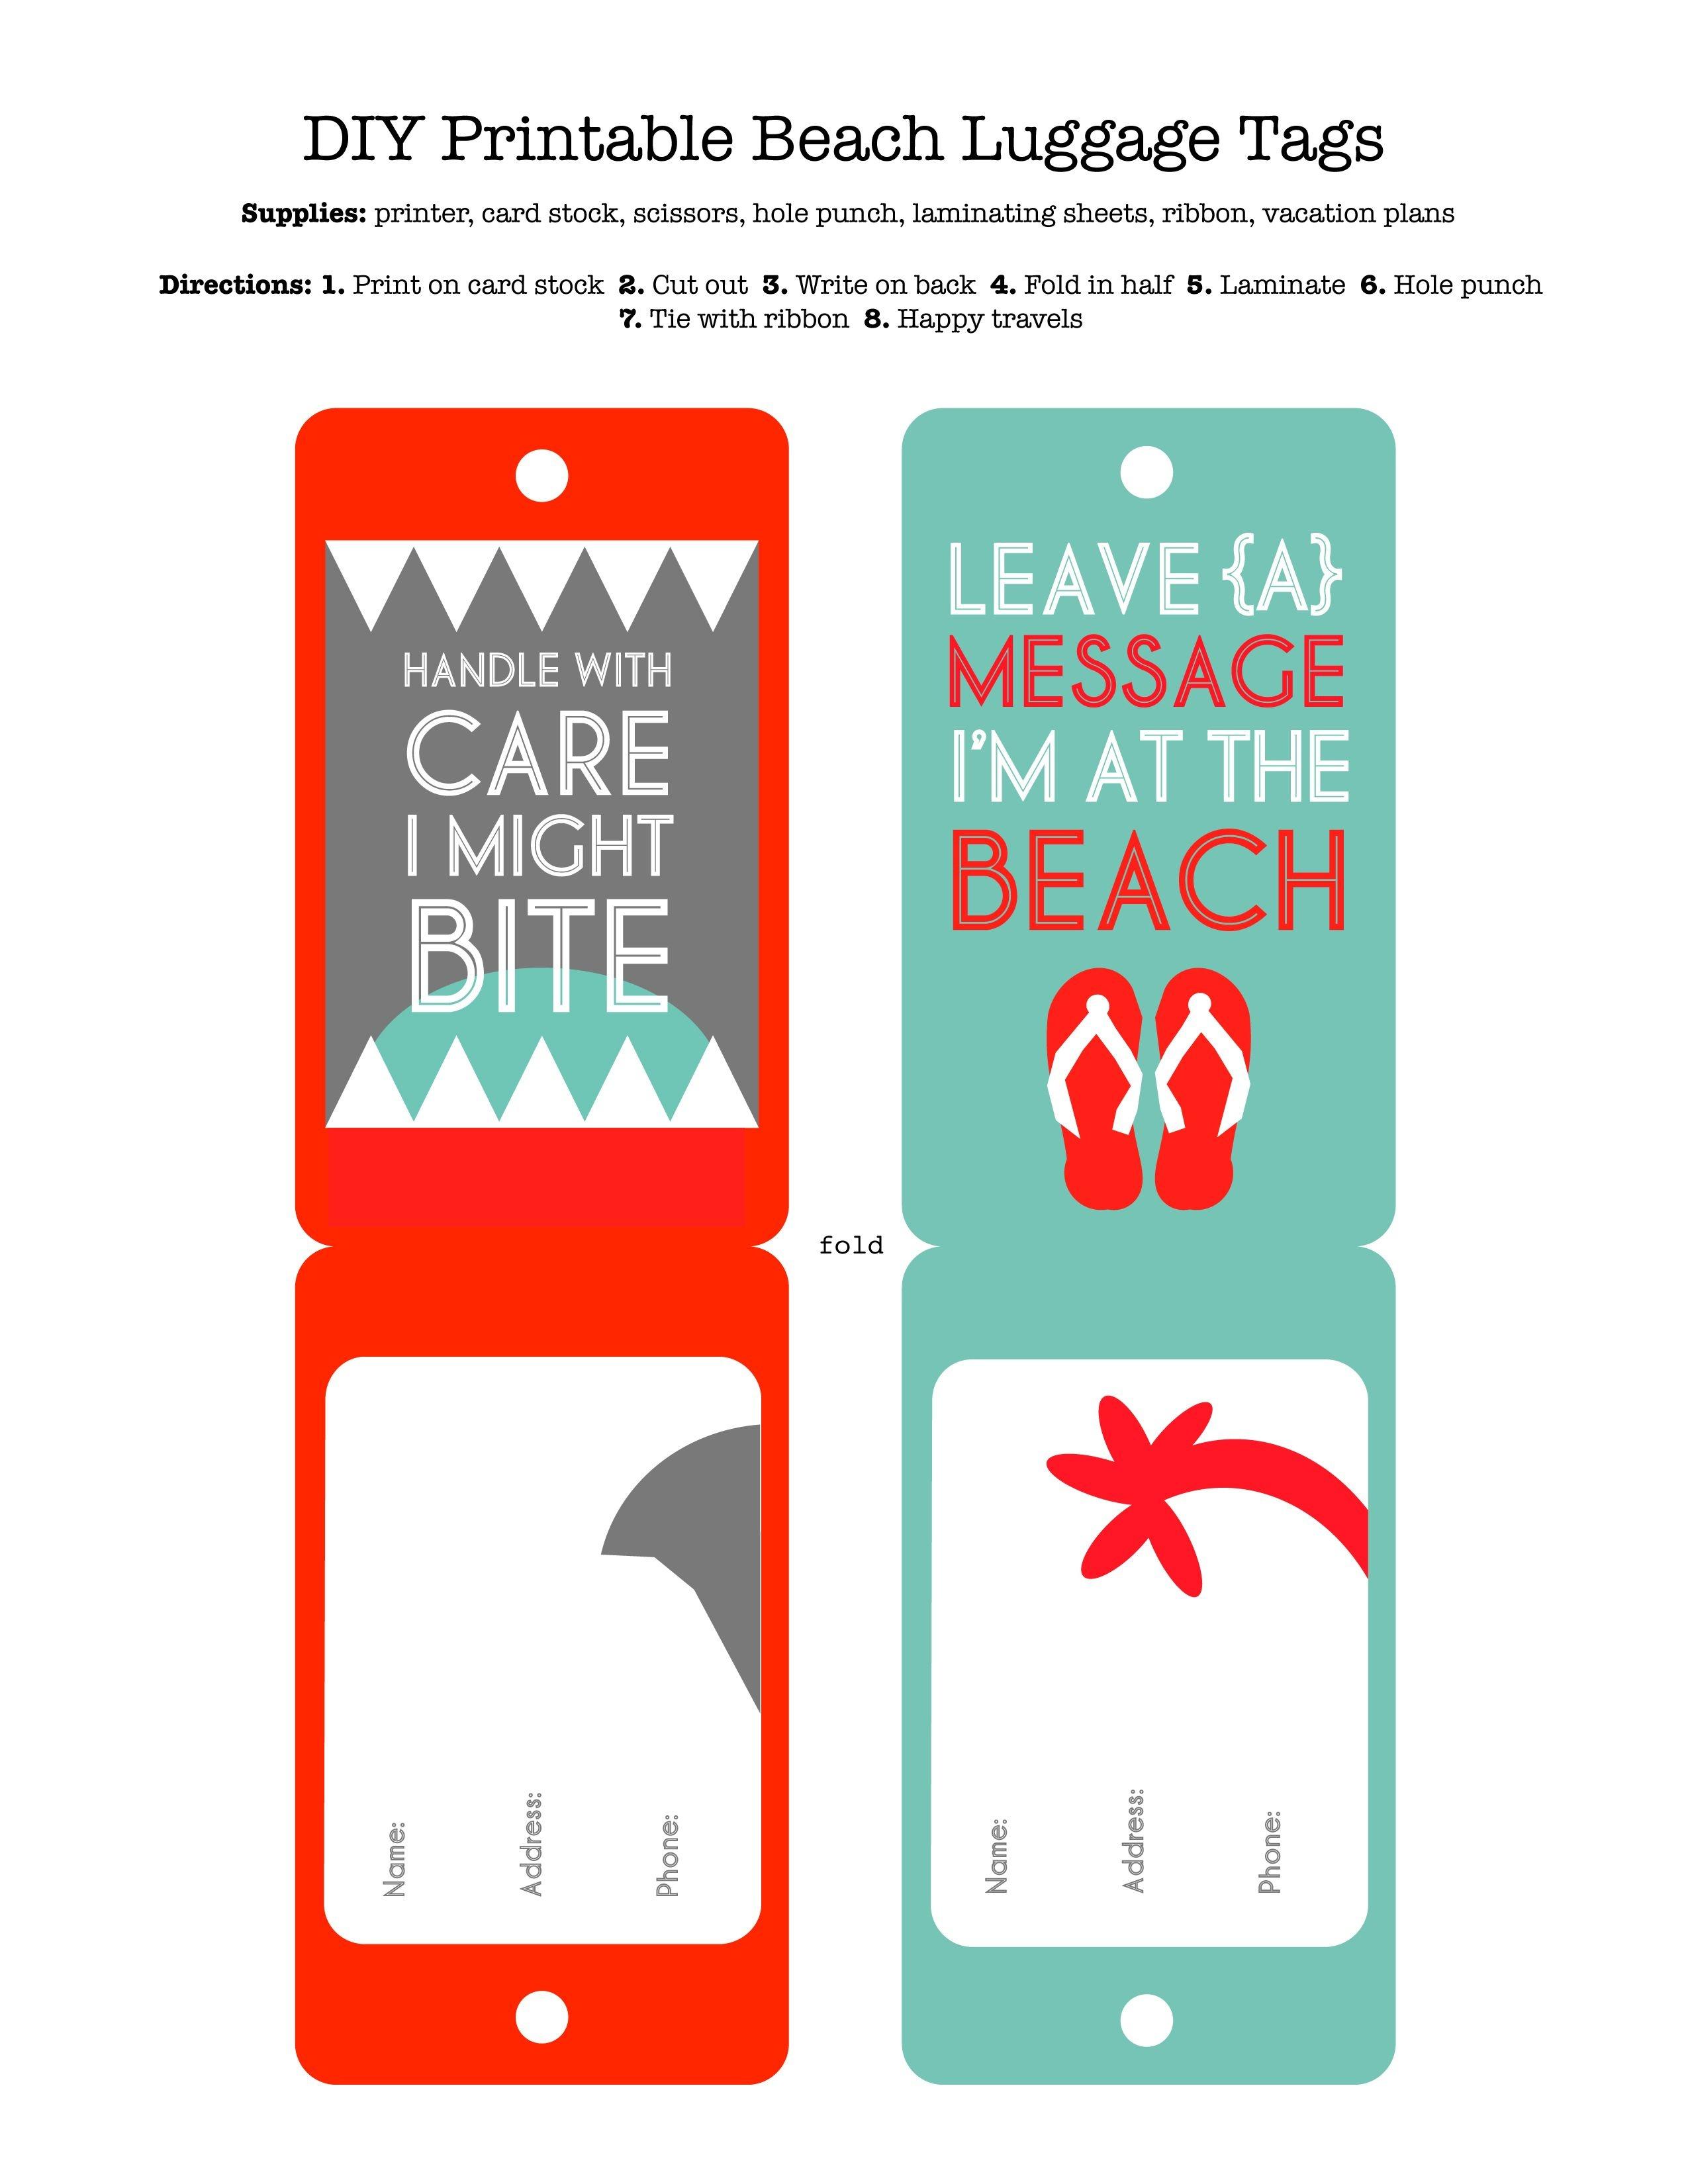 Diy Printable Beach Luggage Tags | Craft Ideas | Funny Luggage Tags - Free Printable Luggage Tags